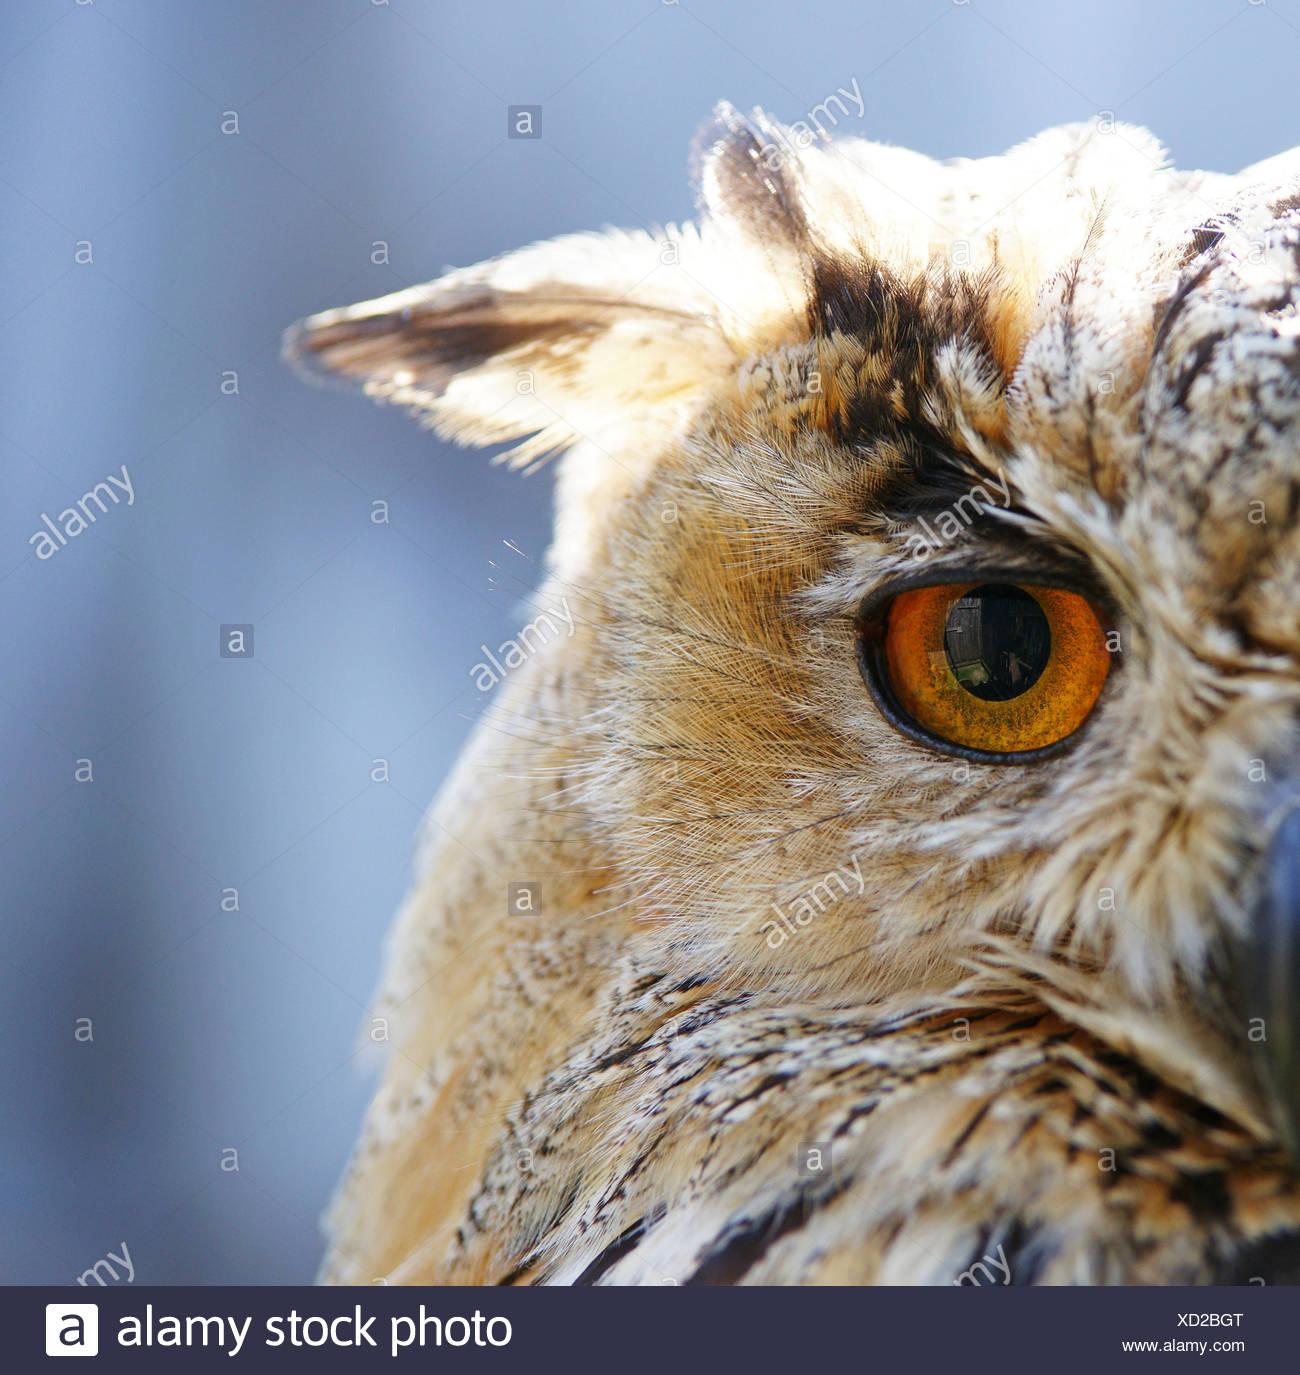 uhu nahaufnahme - eagle-owl - Stock Image